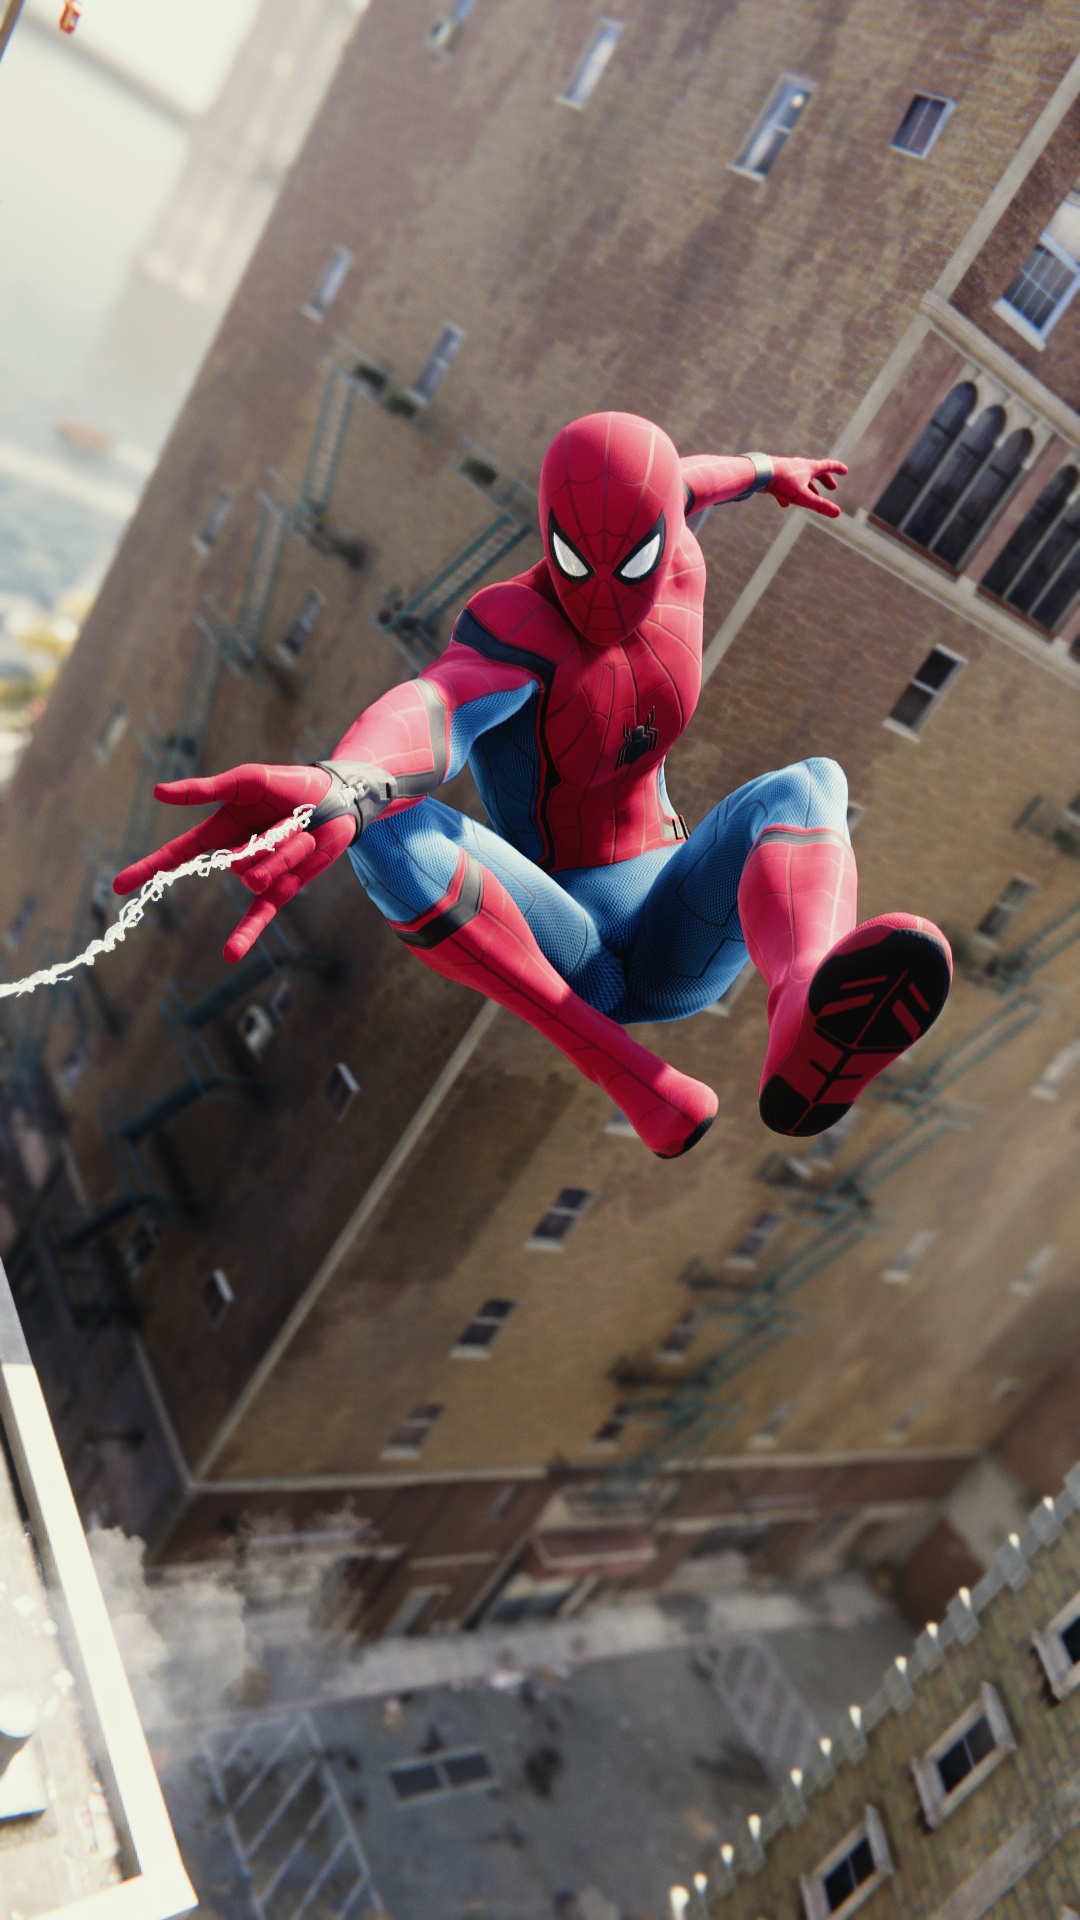 Spiderman Spidermanps4 Marvelsspiderman Marvel Sony Superhero Wallpaper Amazing Spiderman Avengers Wallpaper